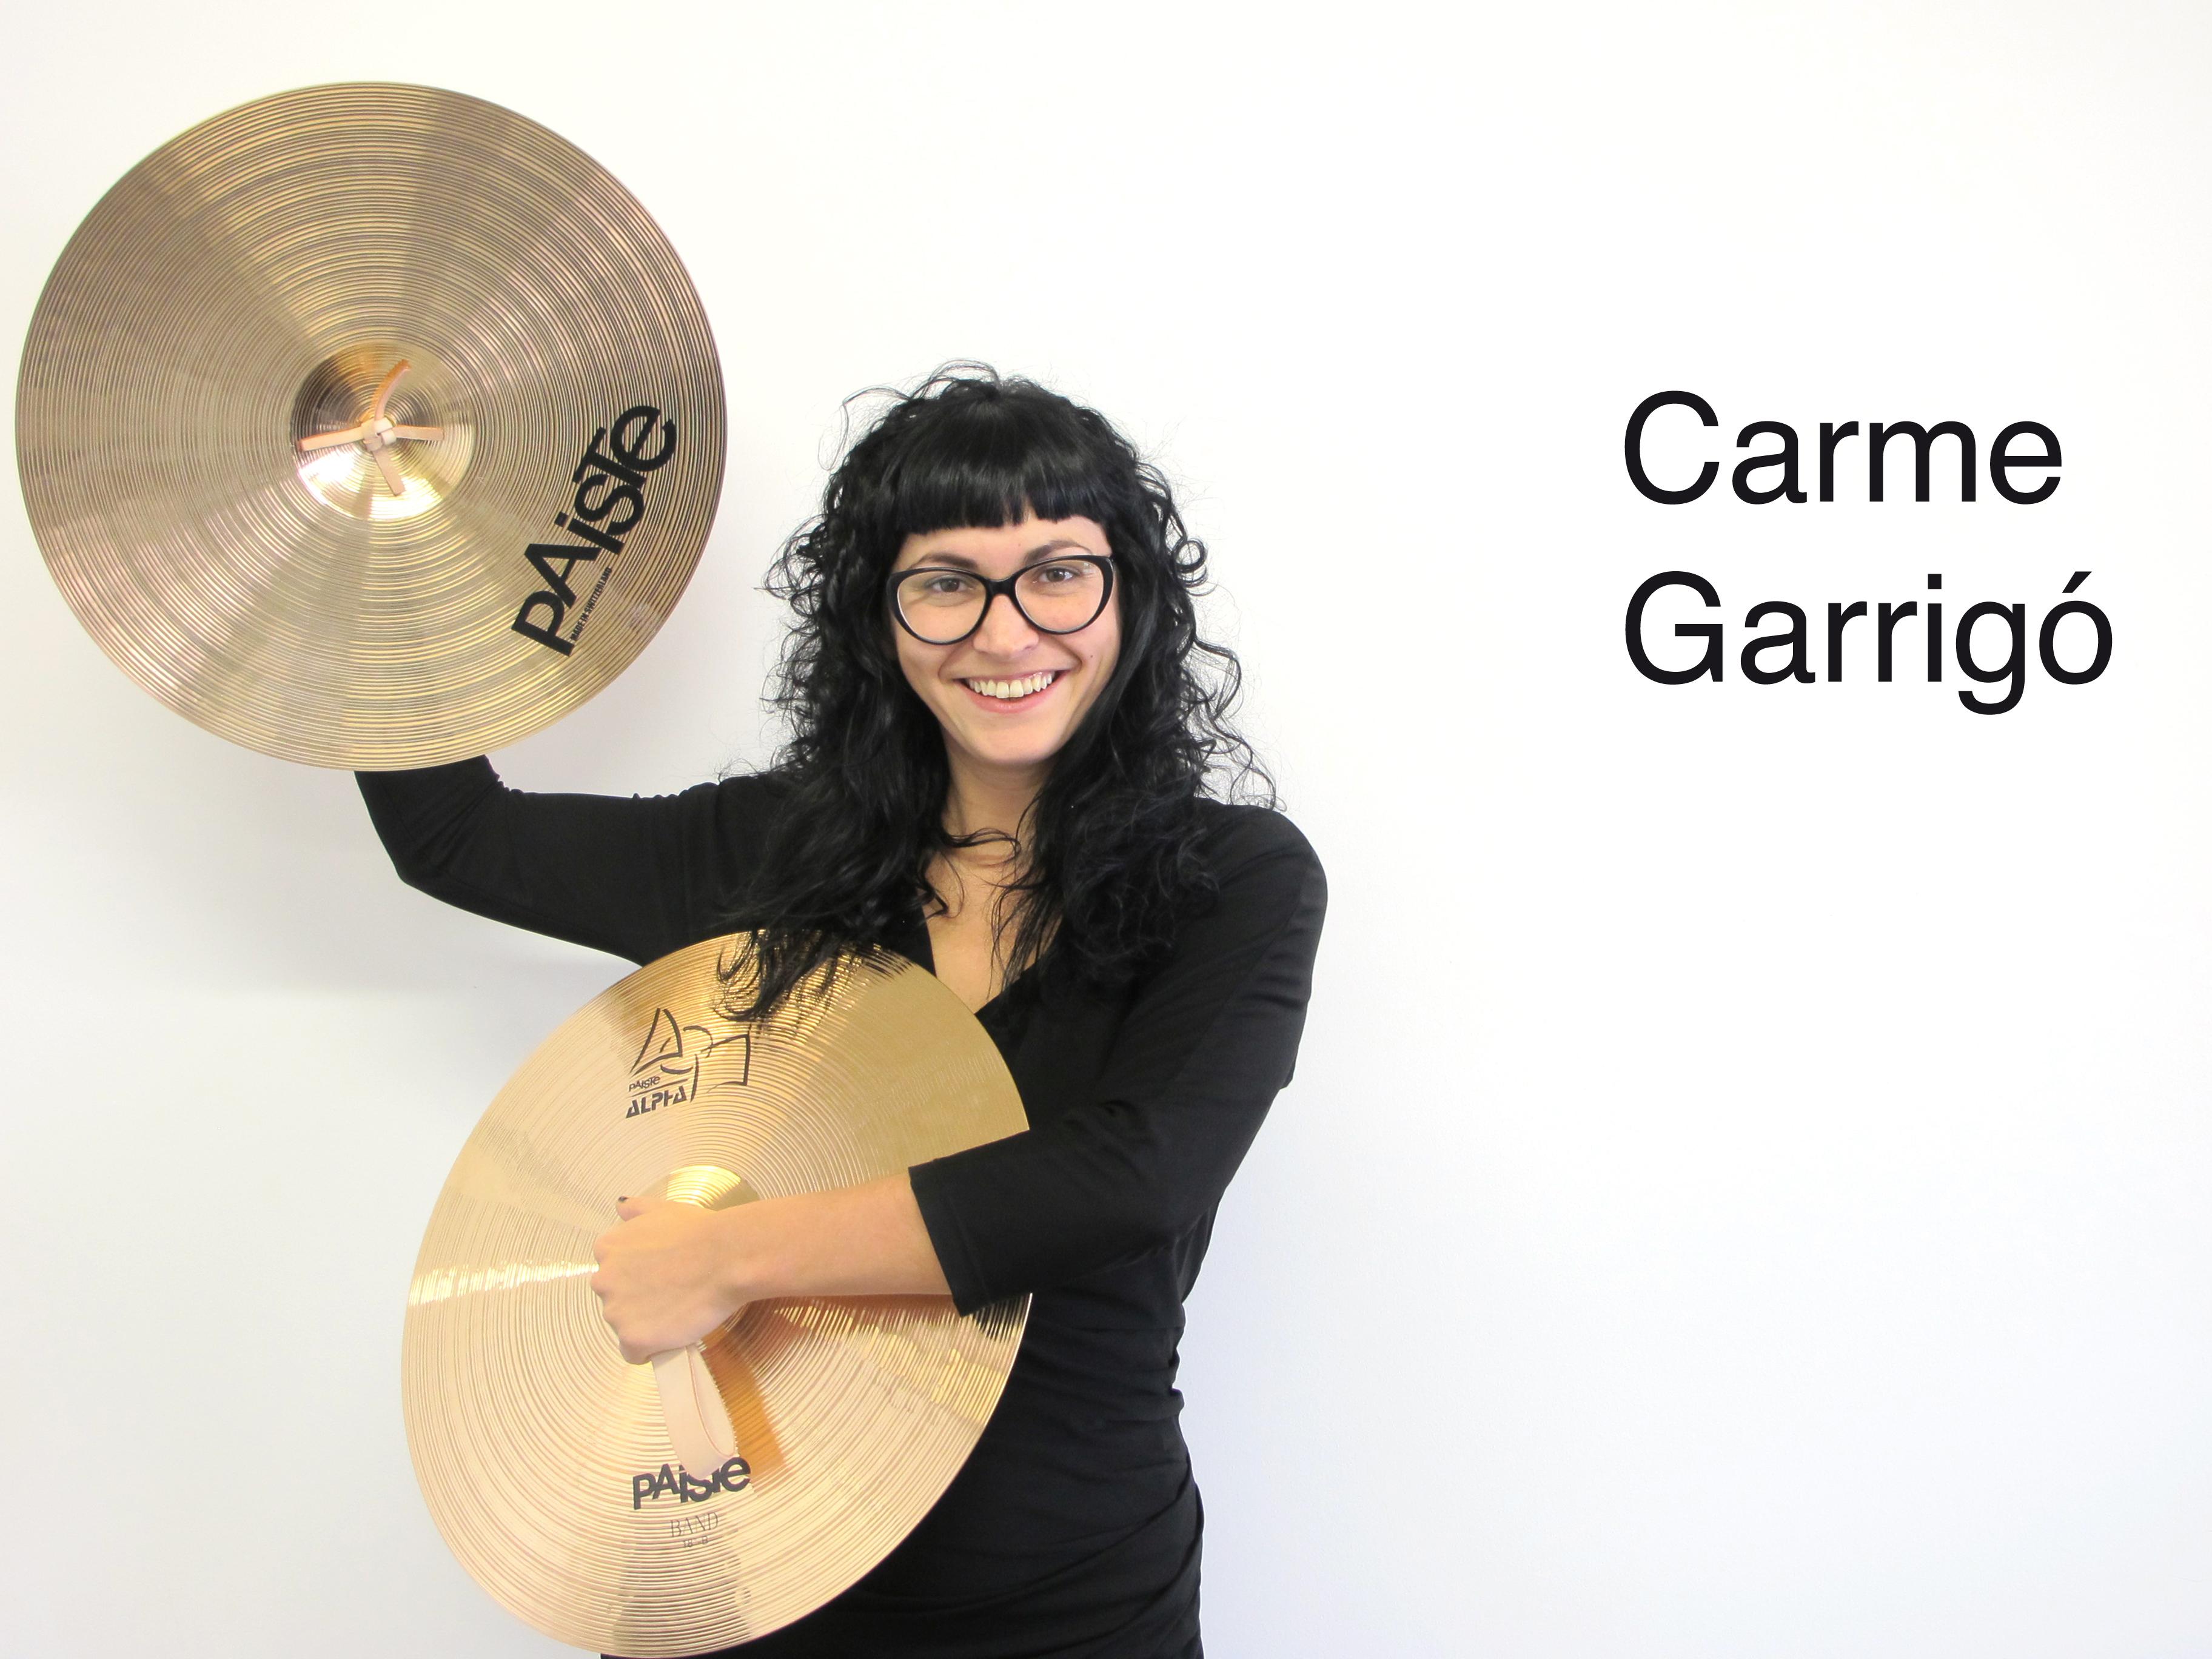 Carme Garrigó